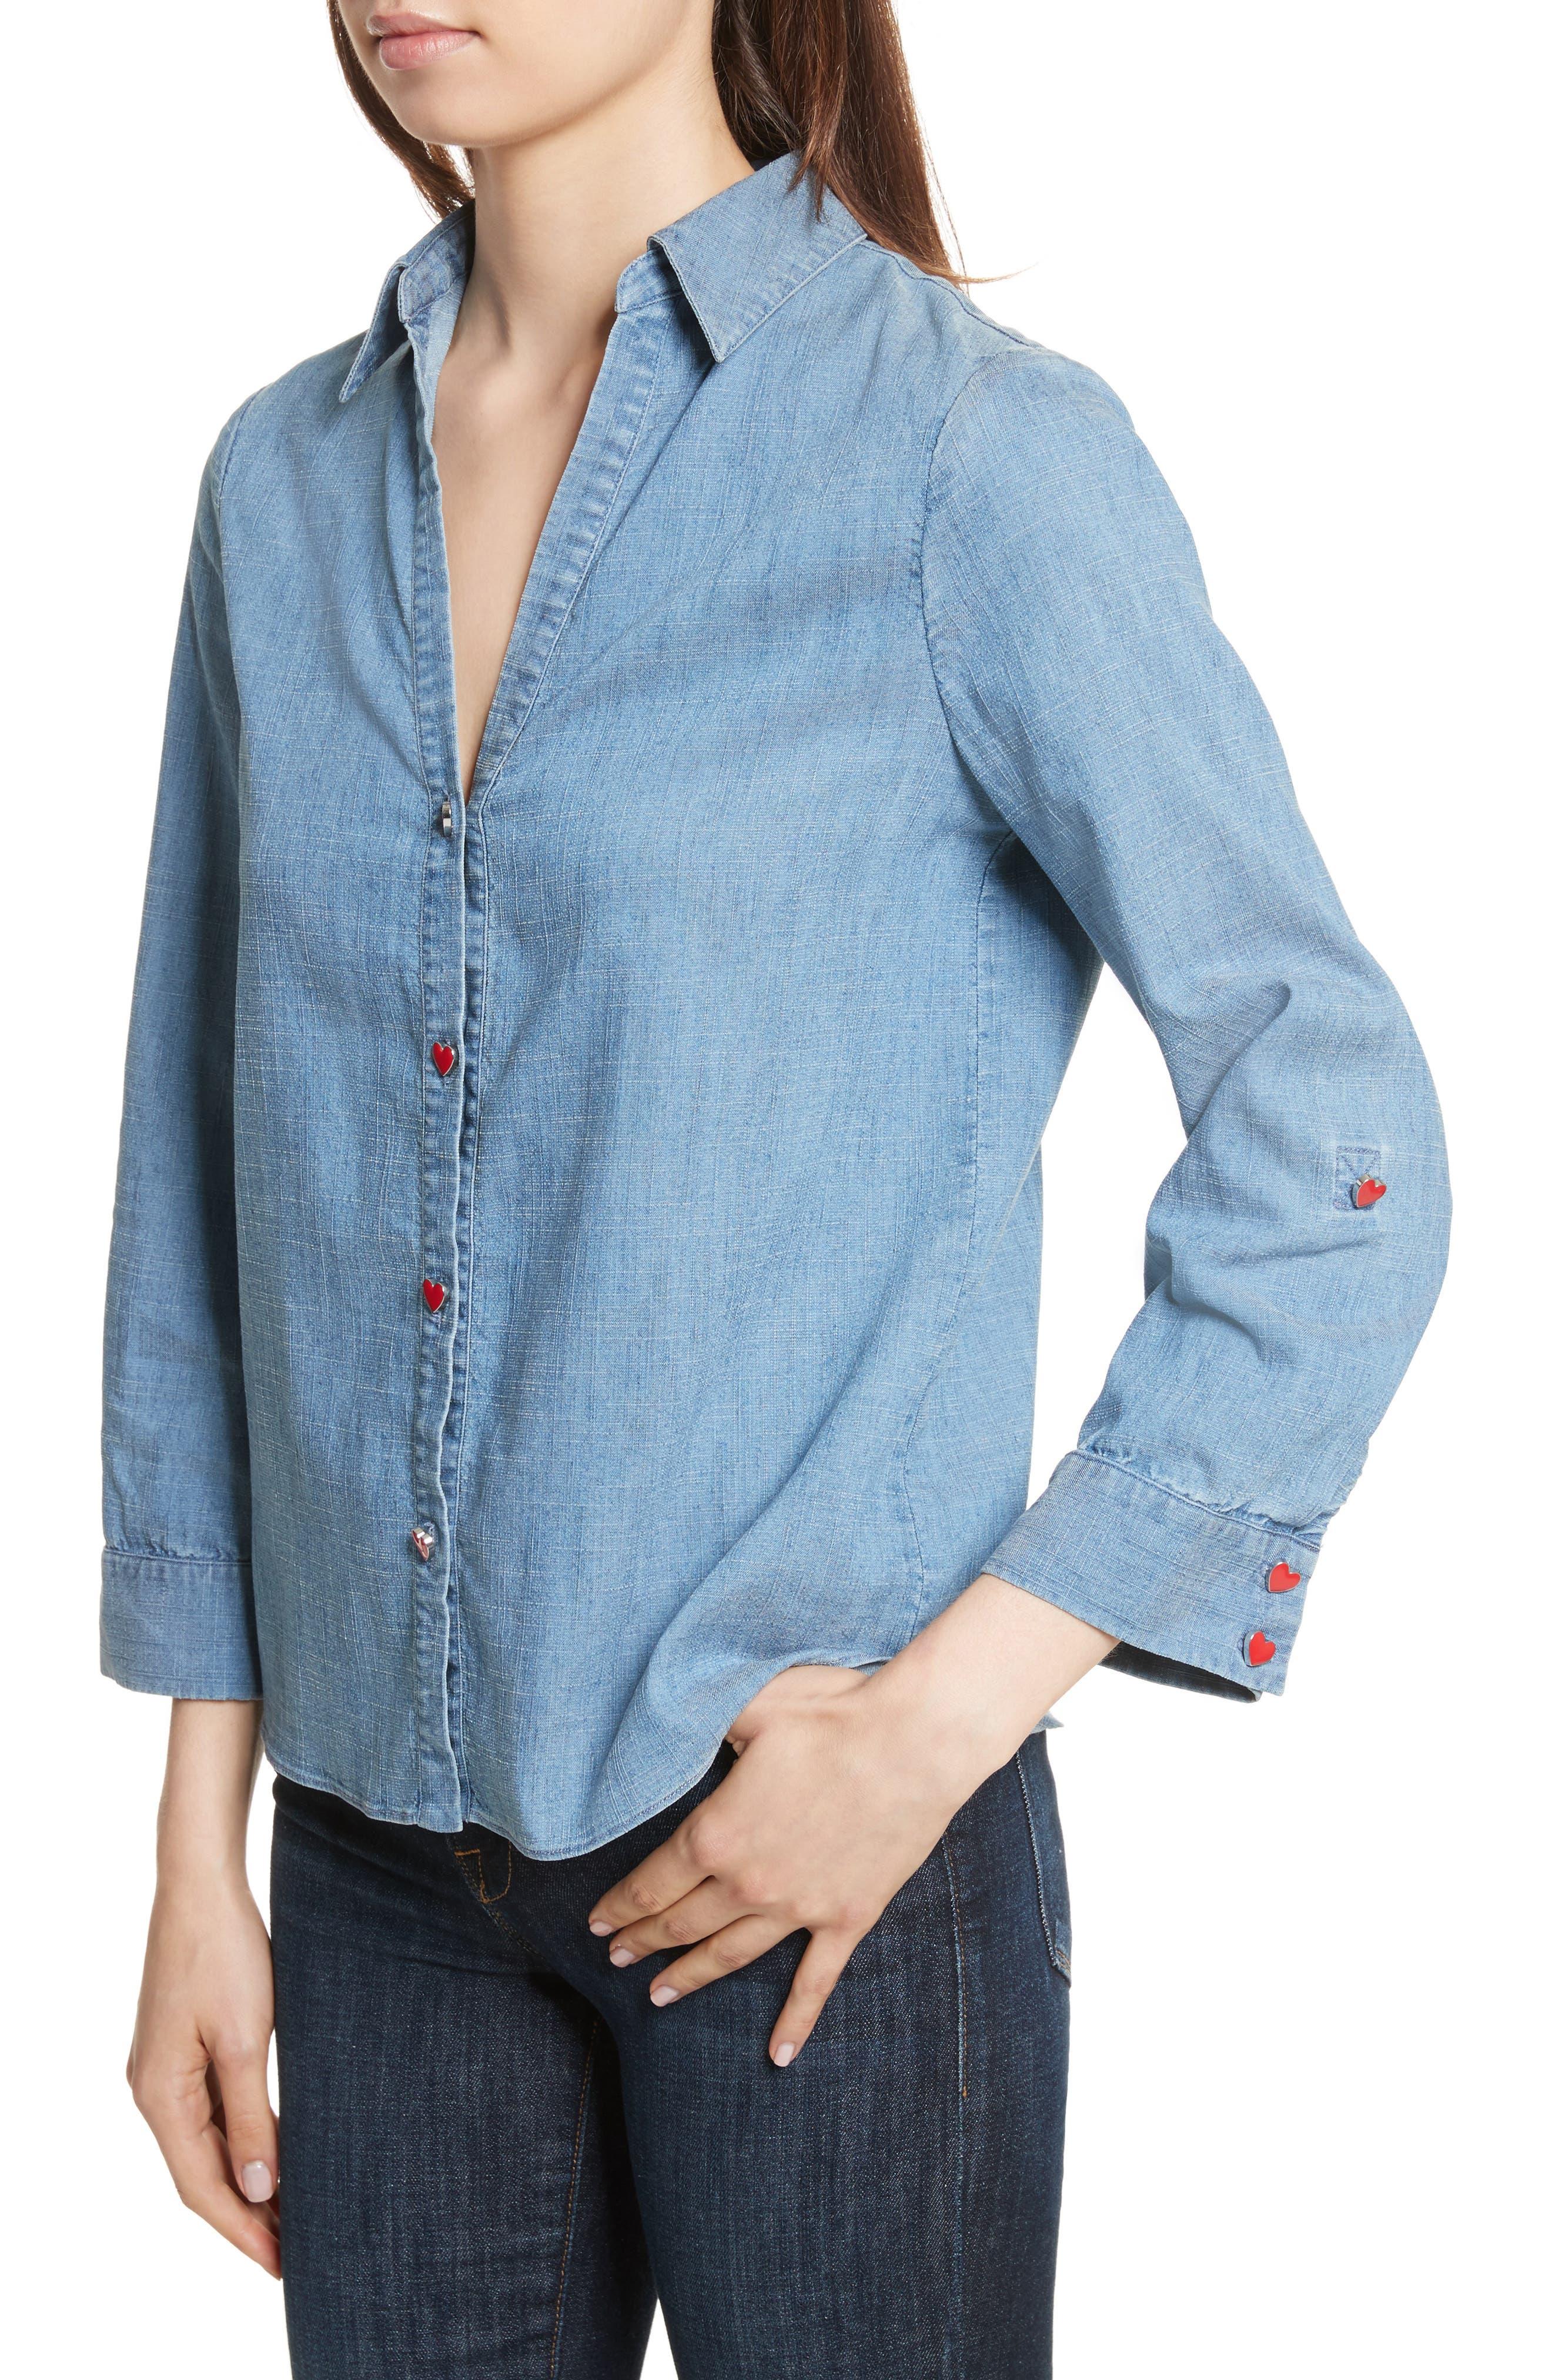 Eloise Appliqué Roll-Cuff Shirt,                             Alternate thumbnail 4, color,                             484